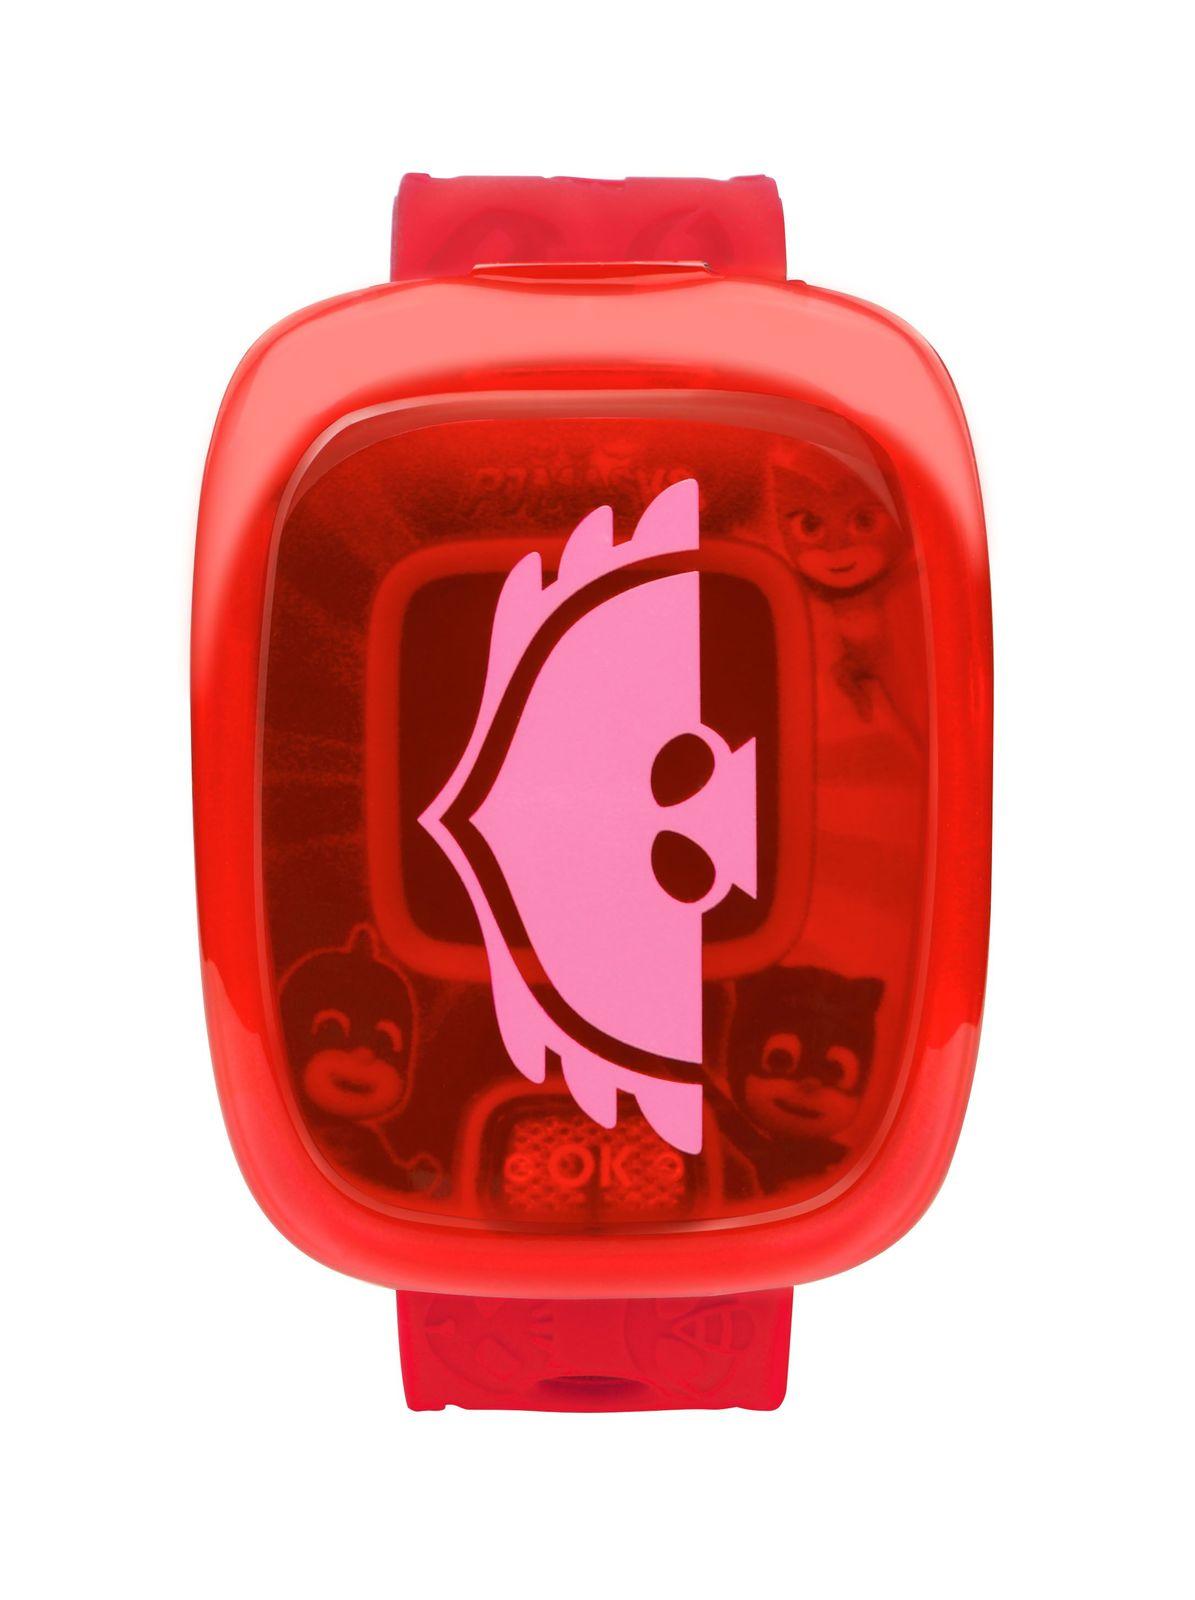 Vtech: PJ Masks - Owlette Learning Watch image